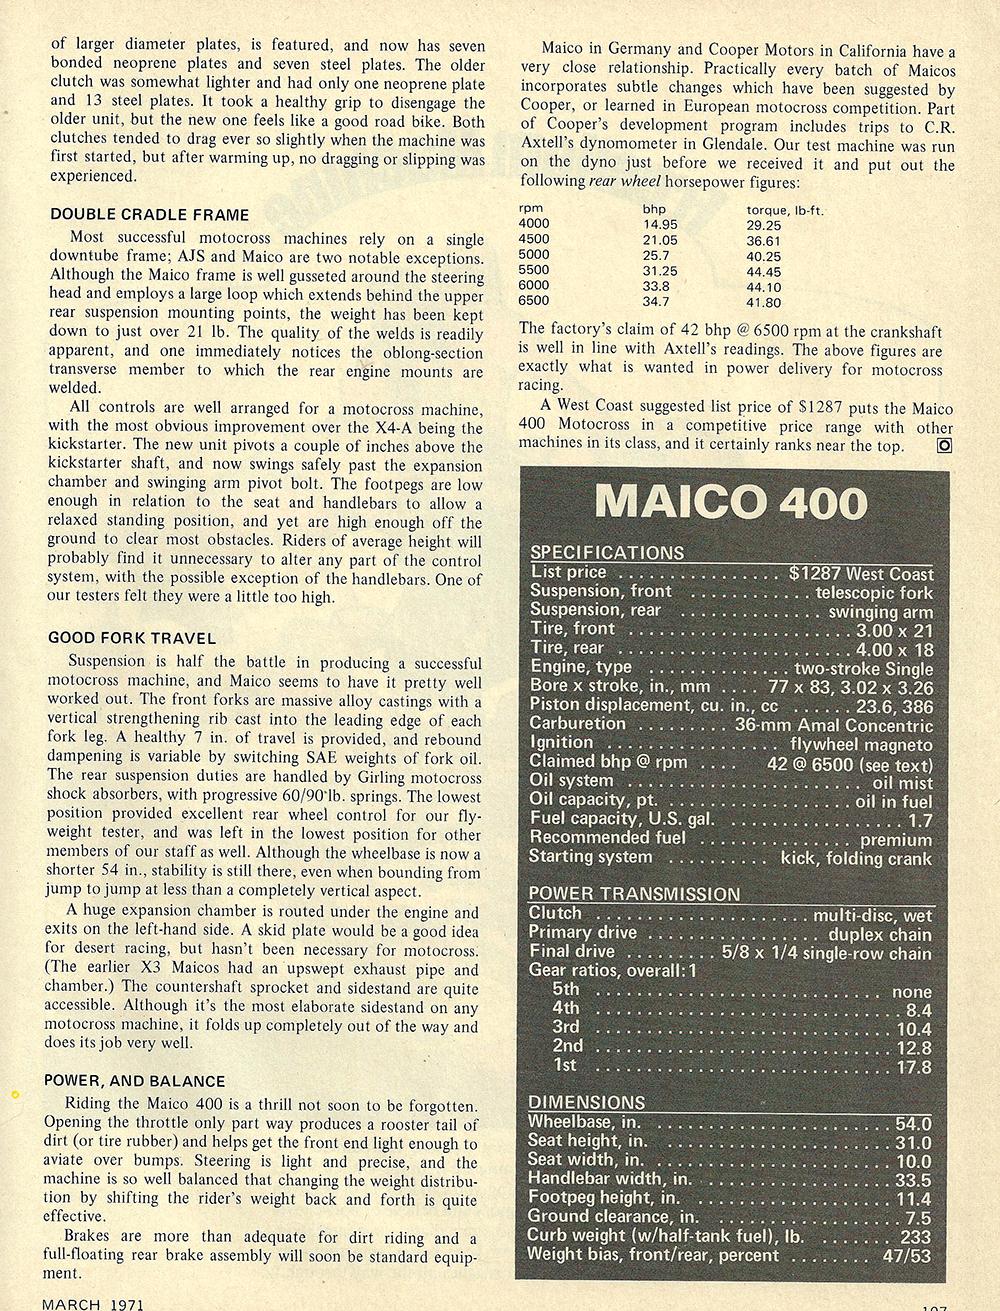 1971 Maico 400 Motocross road test 04.jpg